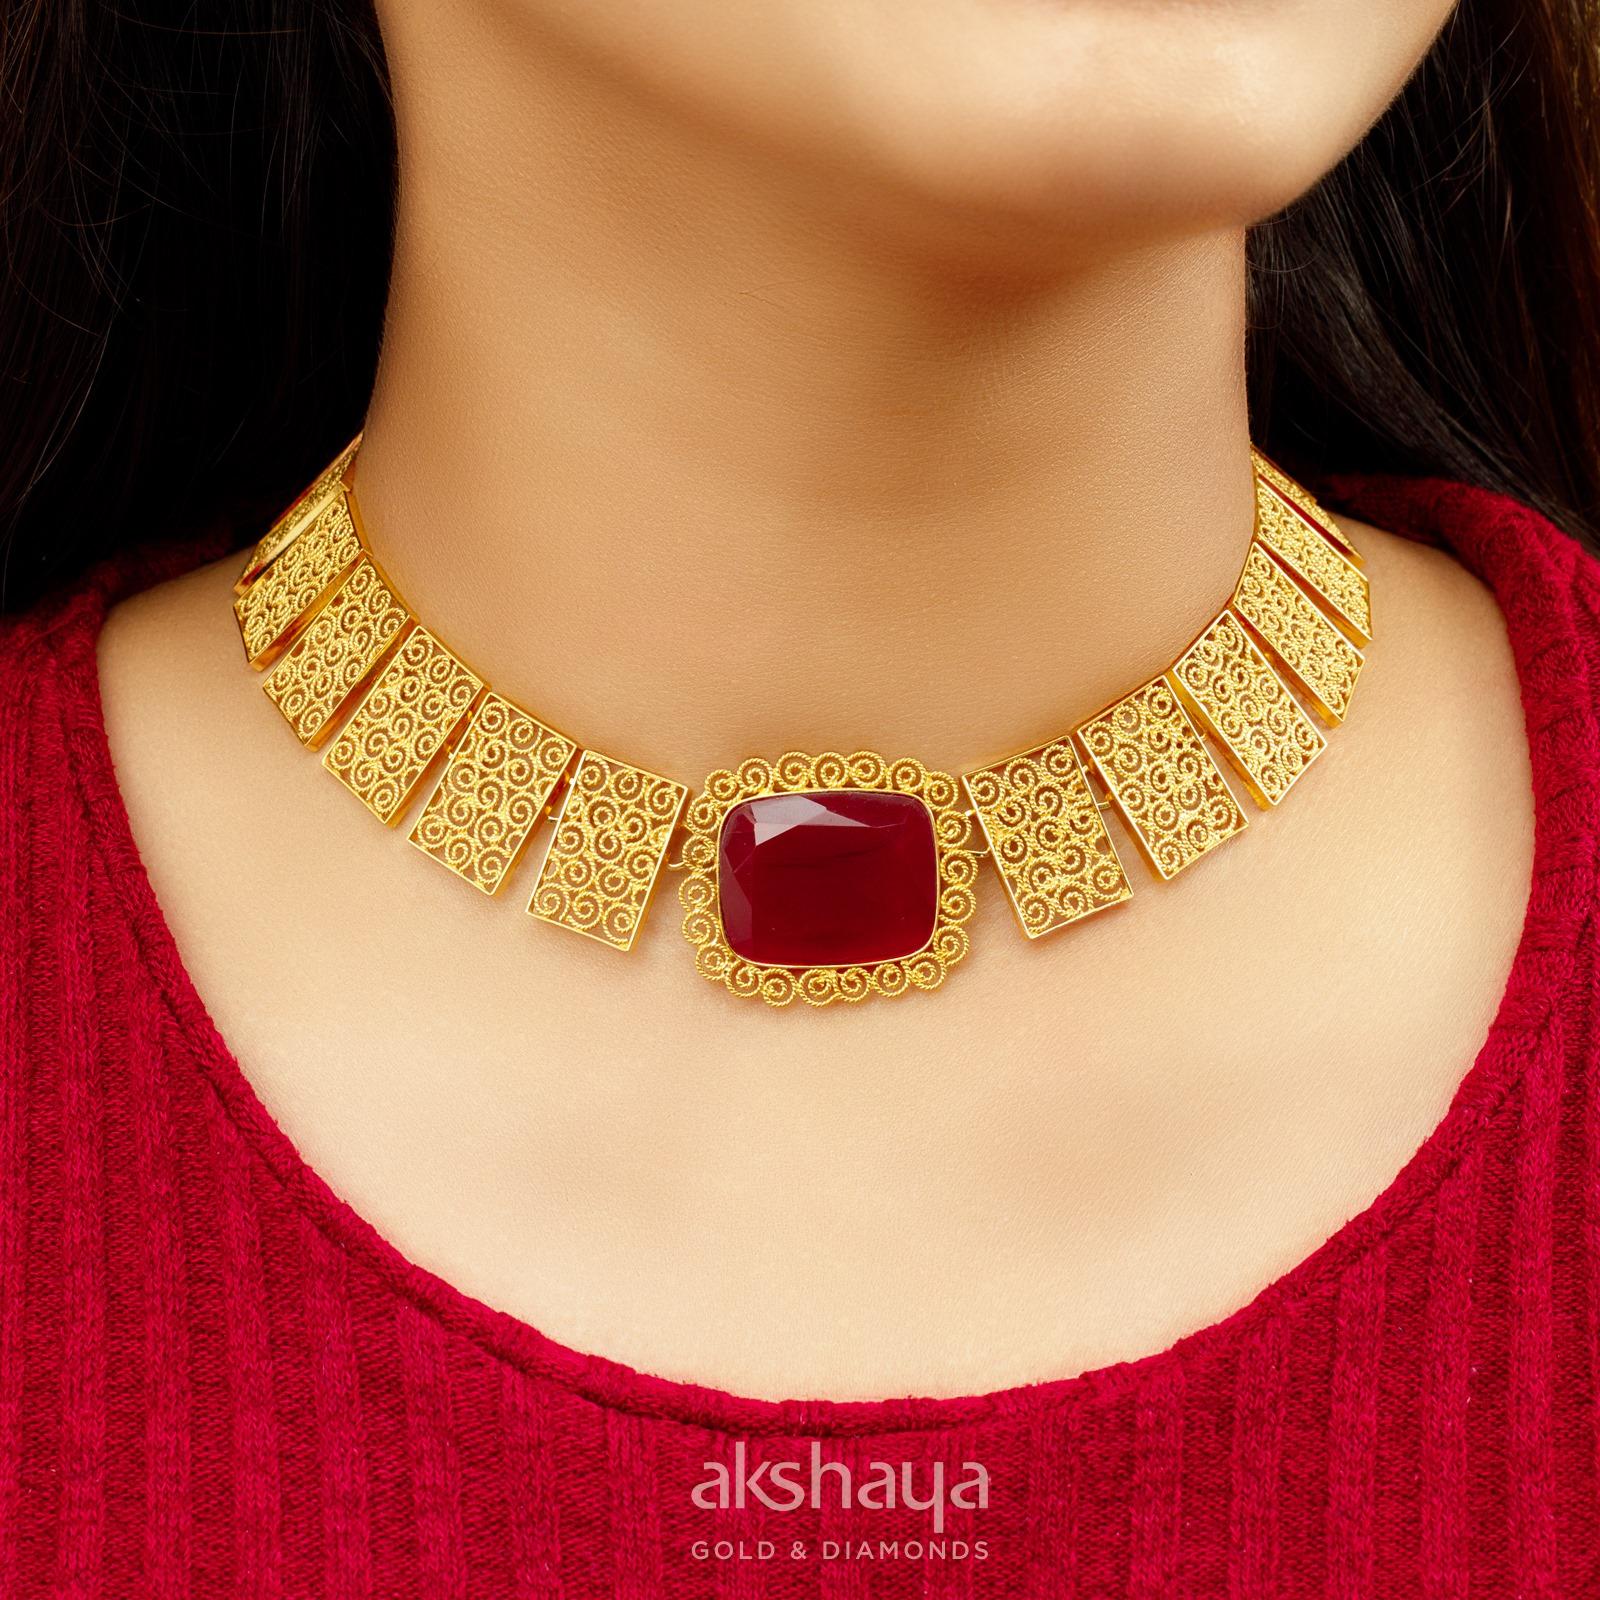 Akshaya Gold Necklace GL10256